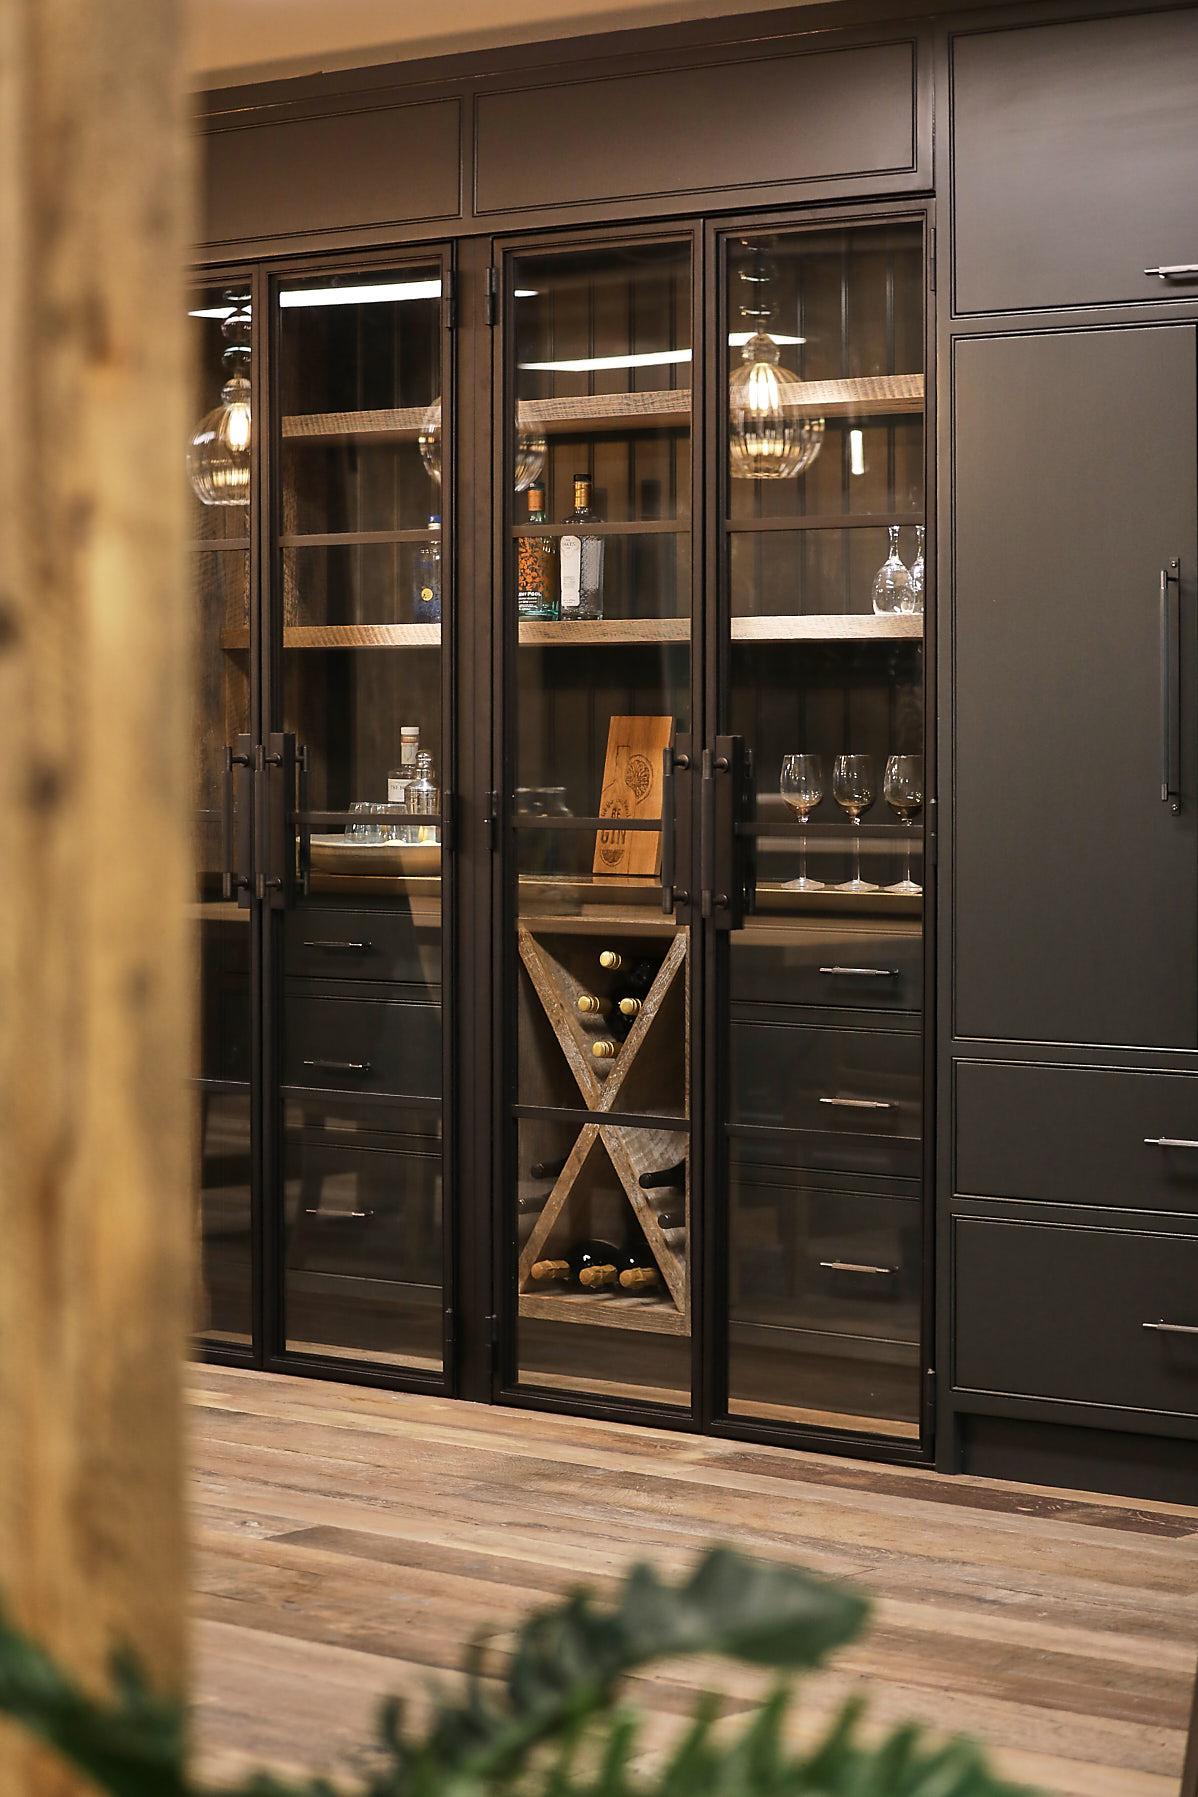 Crittal style black steel doors